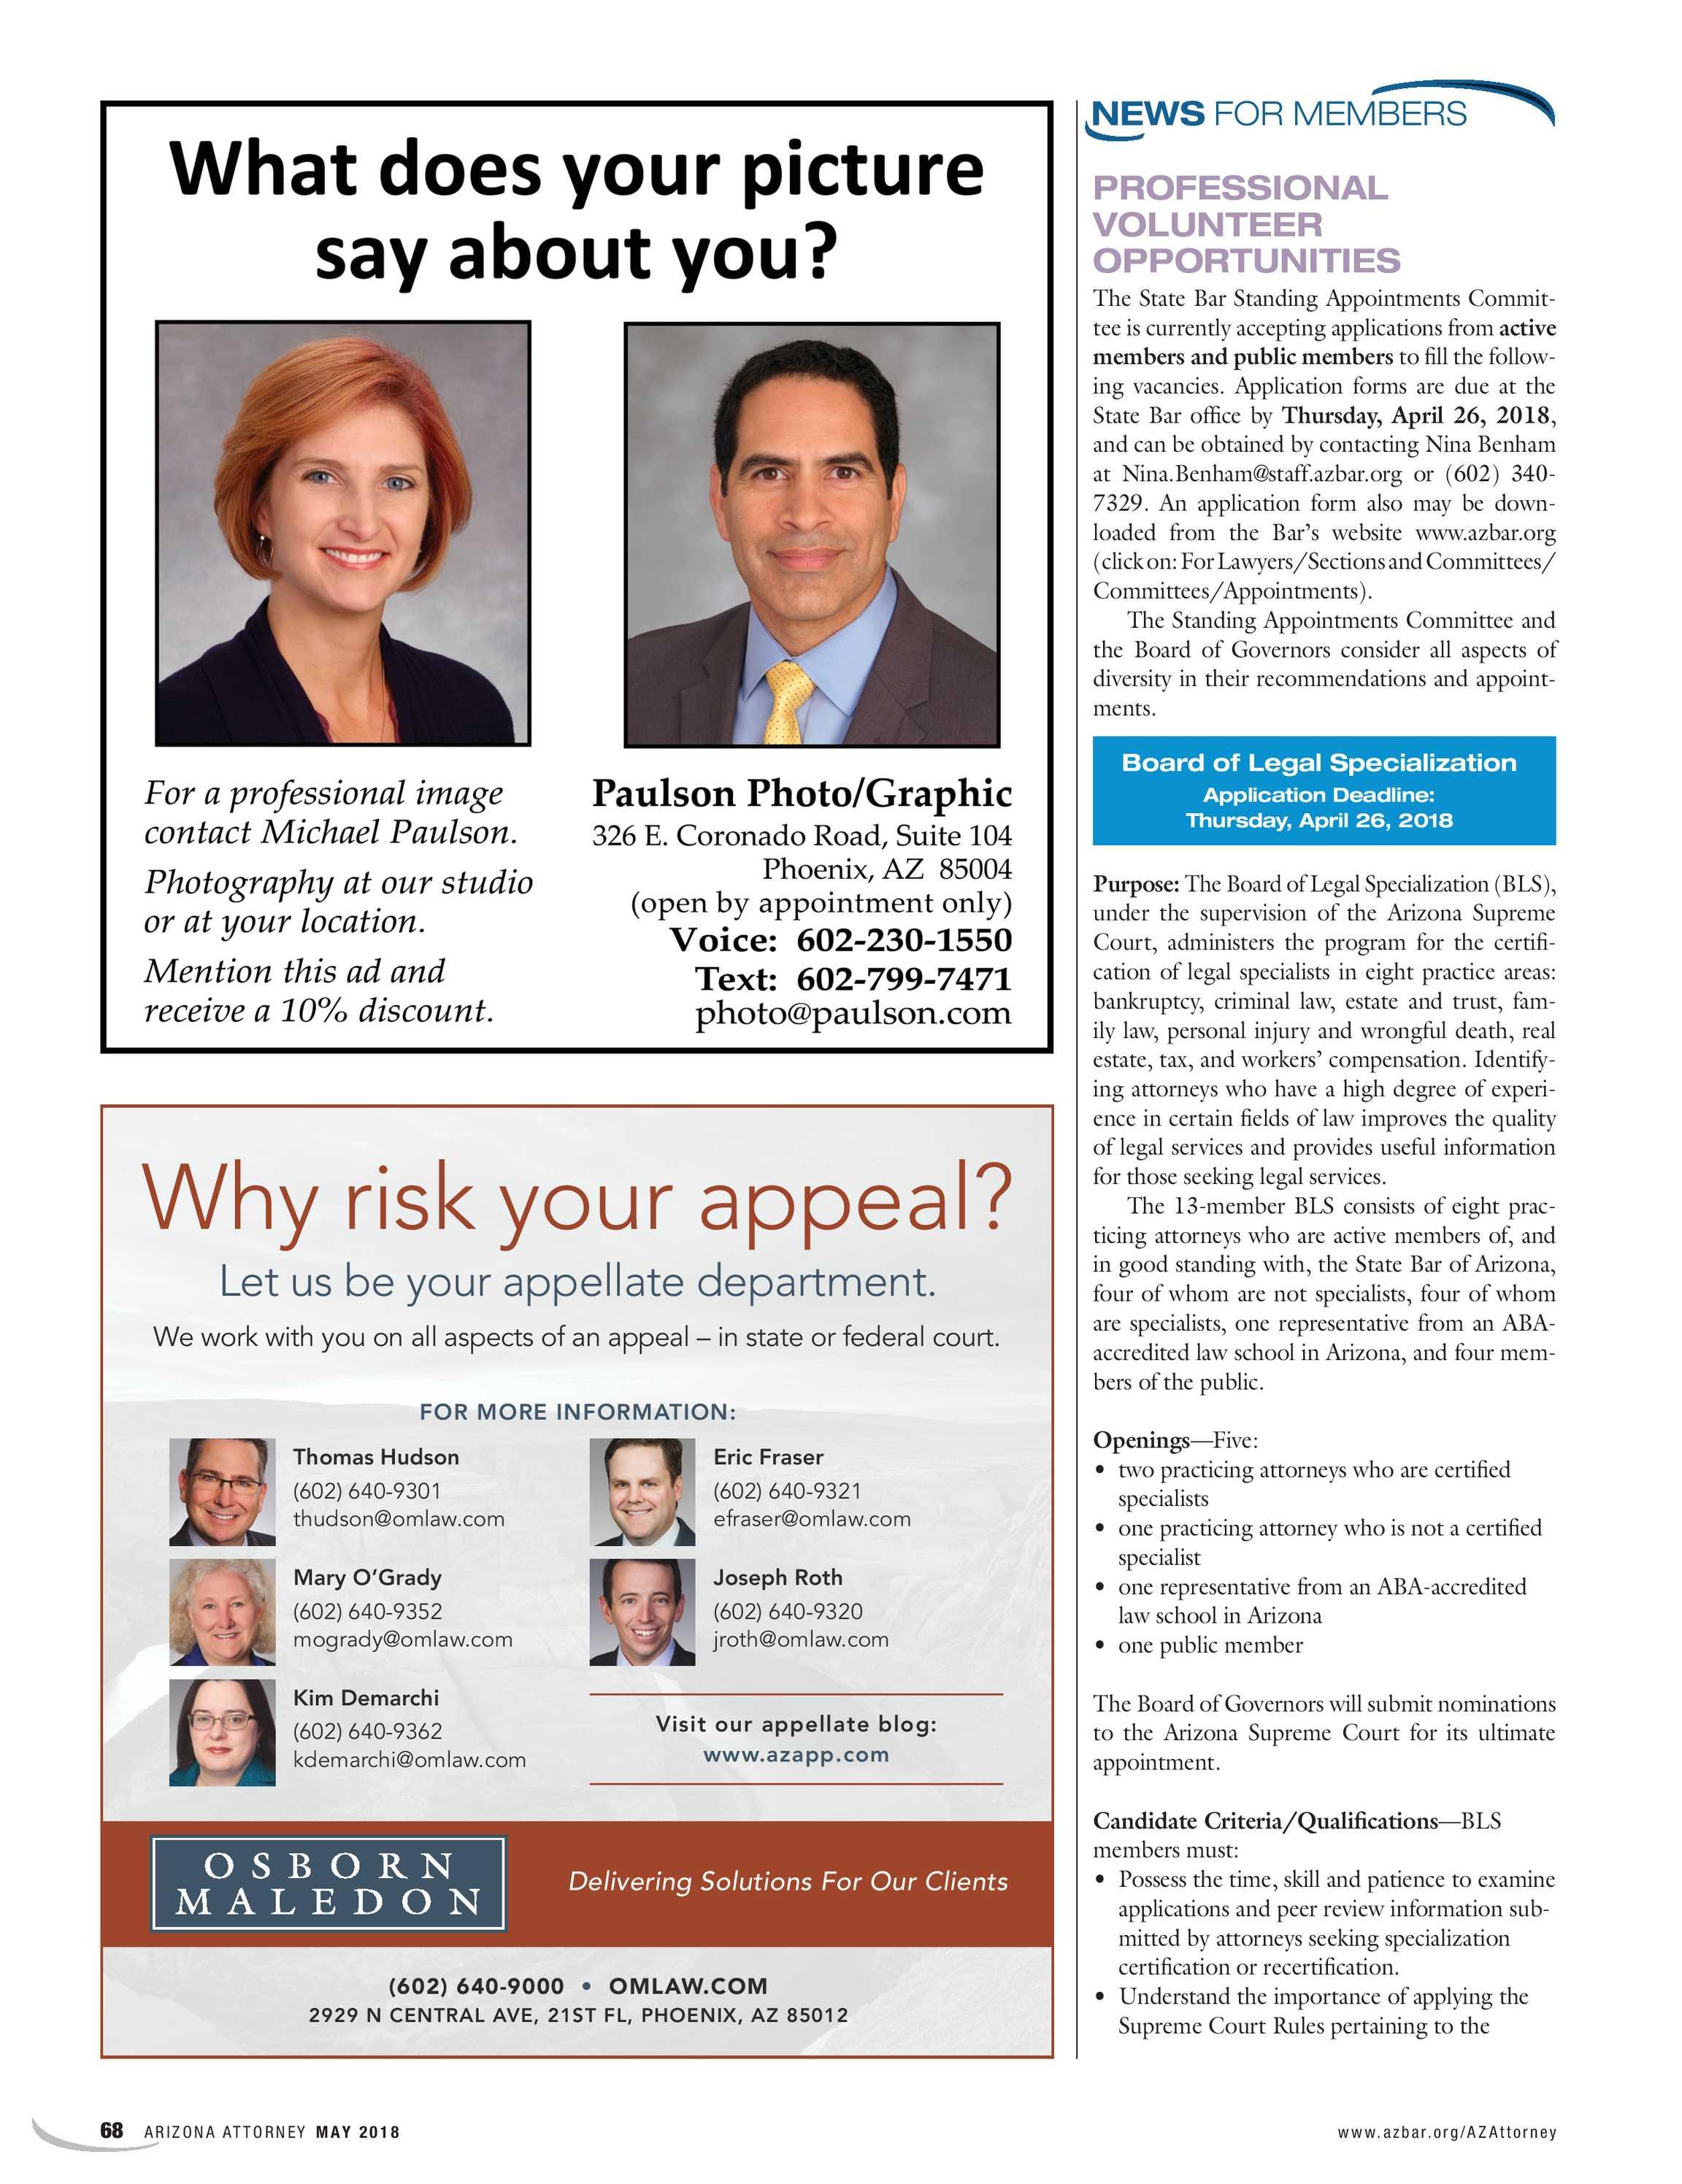 Arizona Attorney May 2018 Page 68